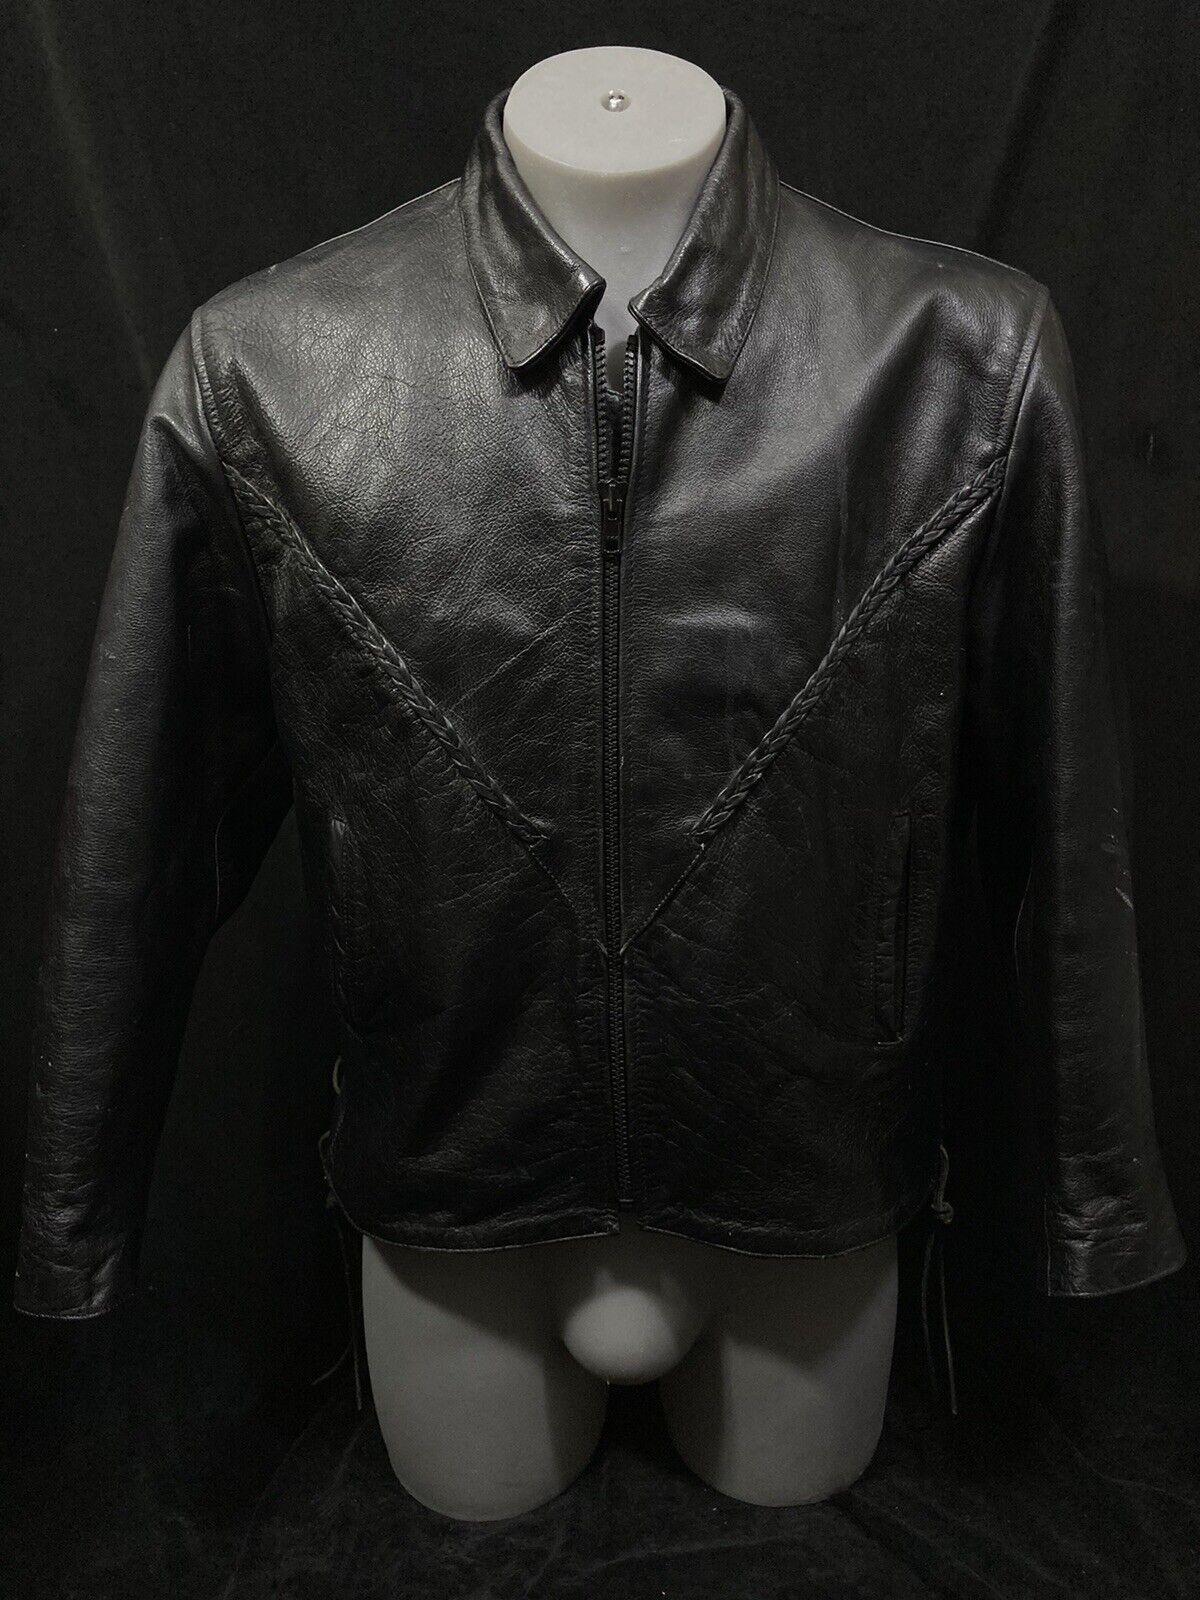 Mñnens Leather Jacket XXL UNIKS Genuine Car Coat Black Lined W Removable Liner